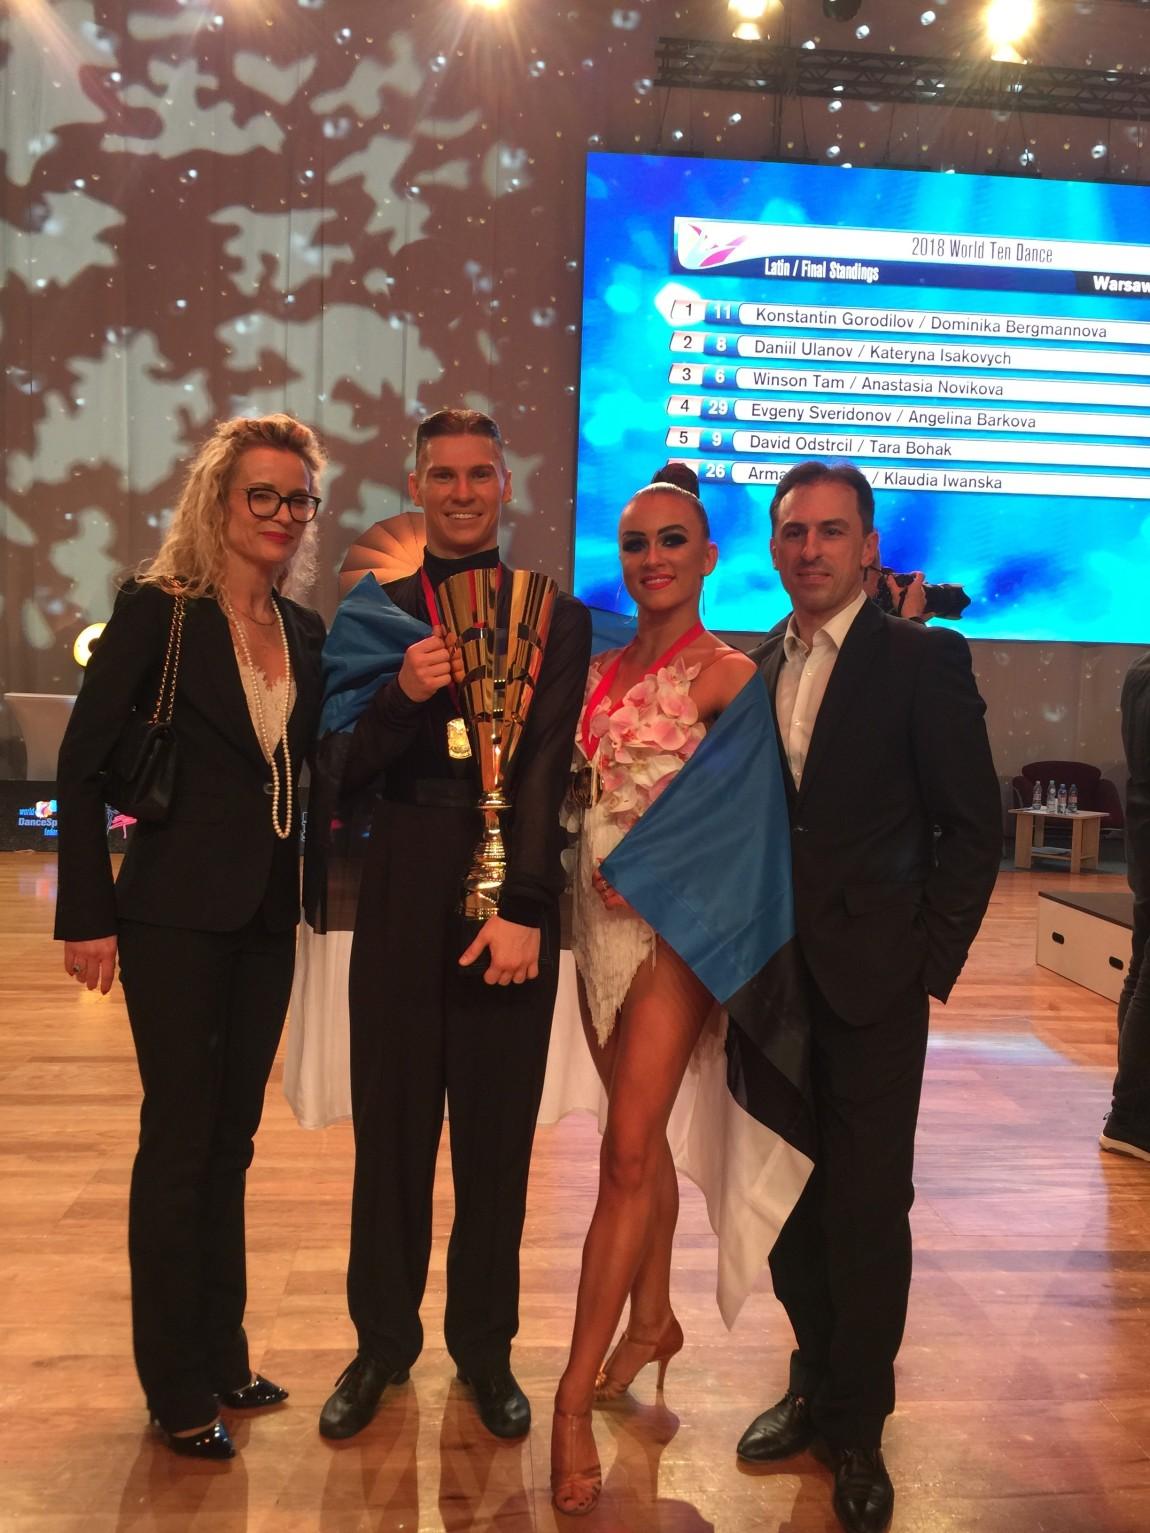 Konstantin Gorodilov ja Dominika Bergmannova are 10-dance World Champions!